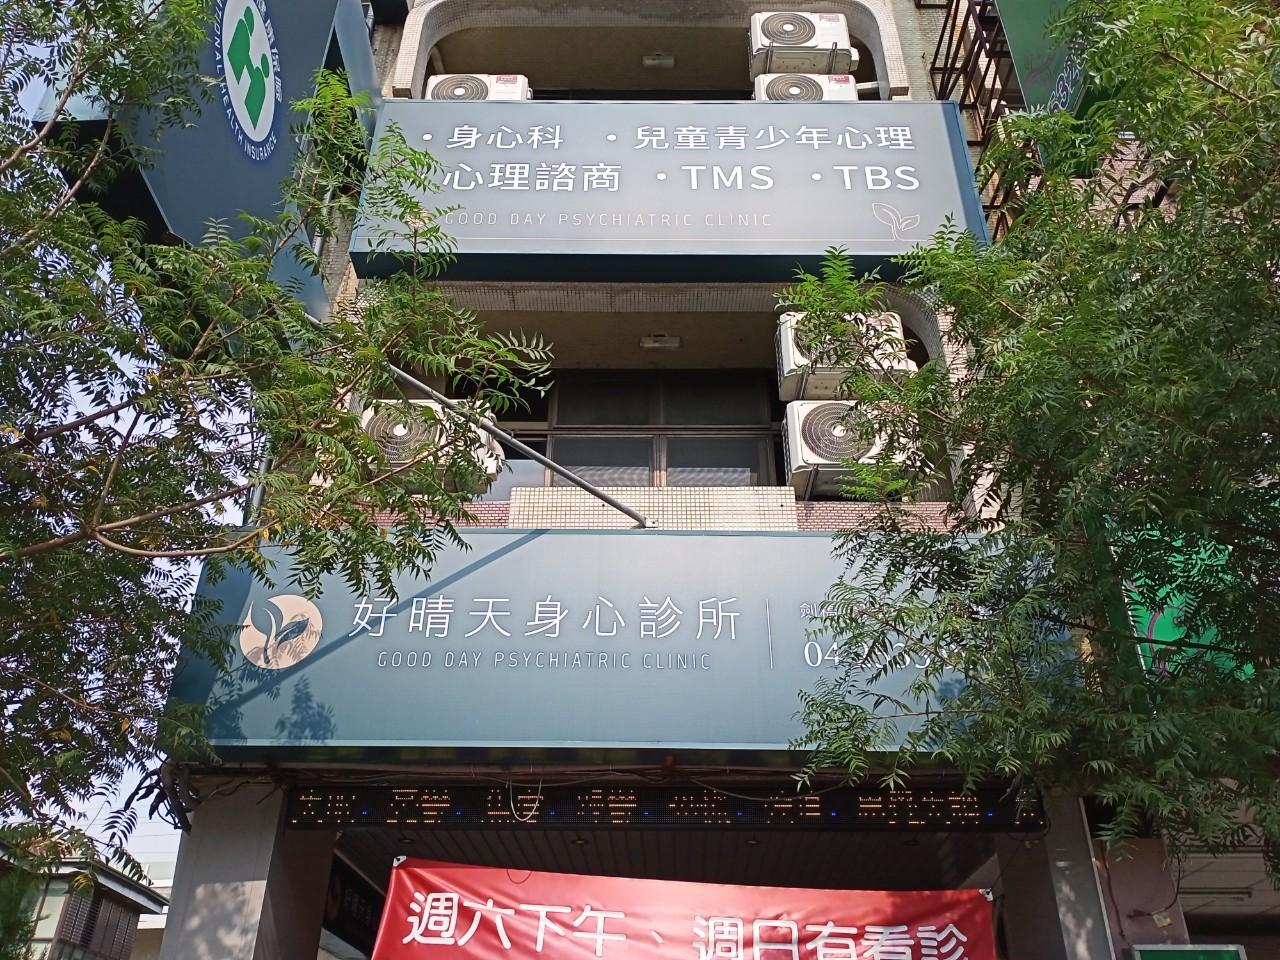 LINE ALBUM 潭子好晴天身心診所警民連線安裝施工 210902 7